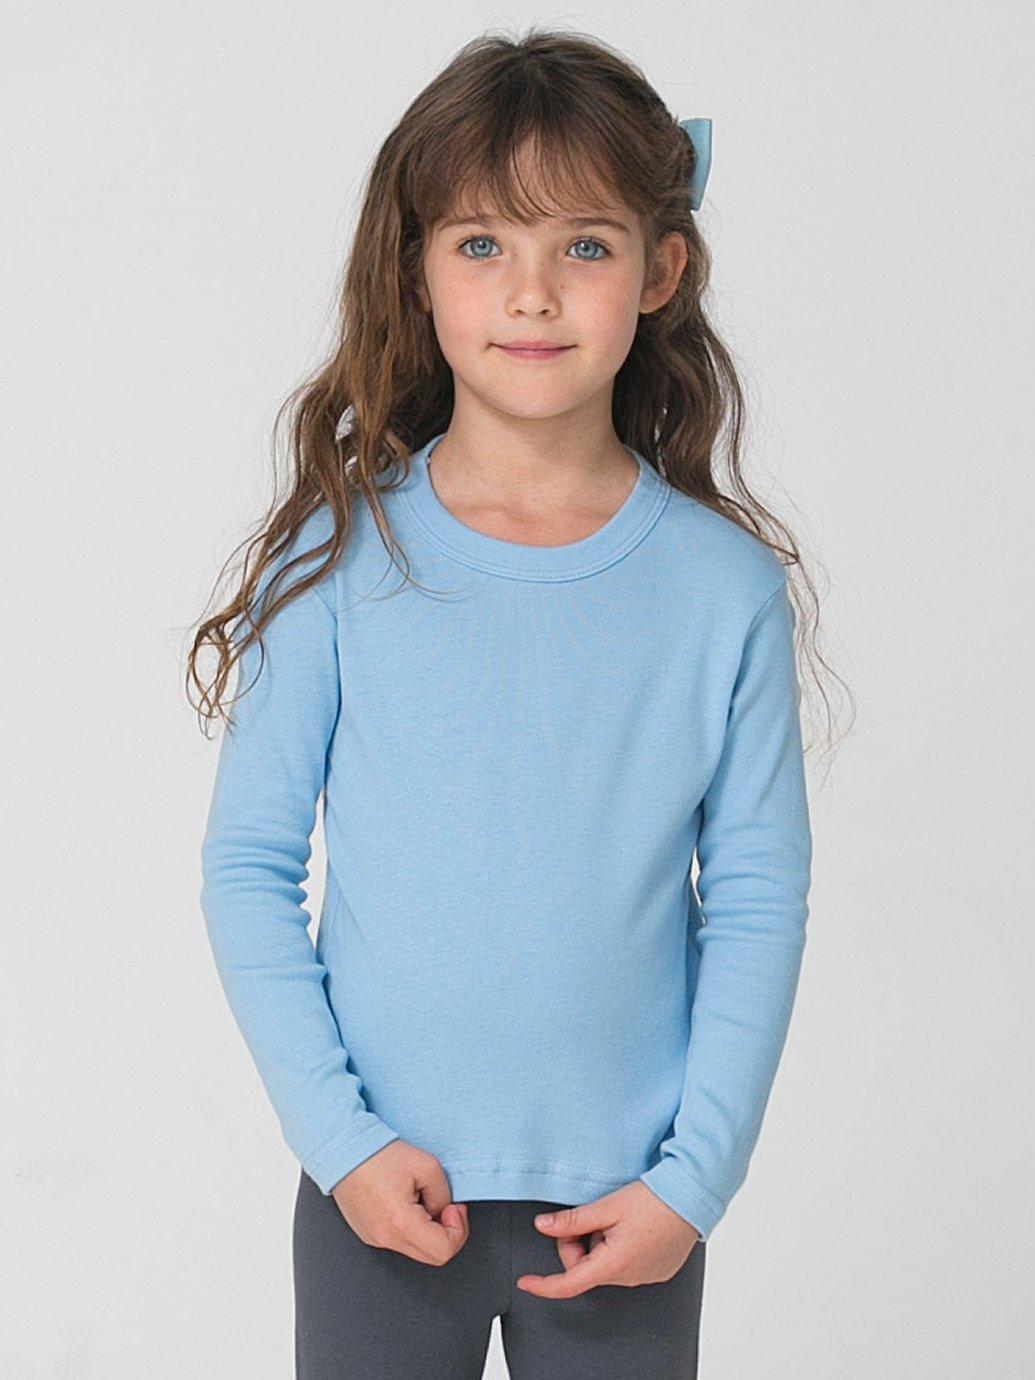 fc2f4c73 American Apparel Kids Baby Rib Long Sleeve T-Shirt - Evan Webster INK